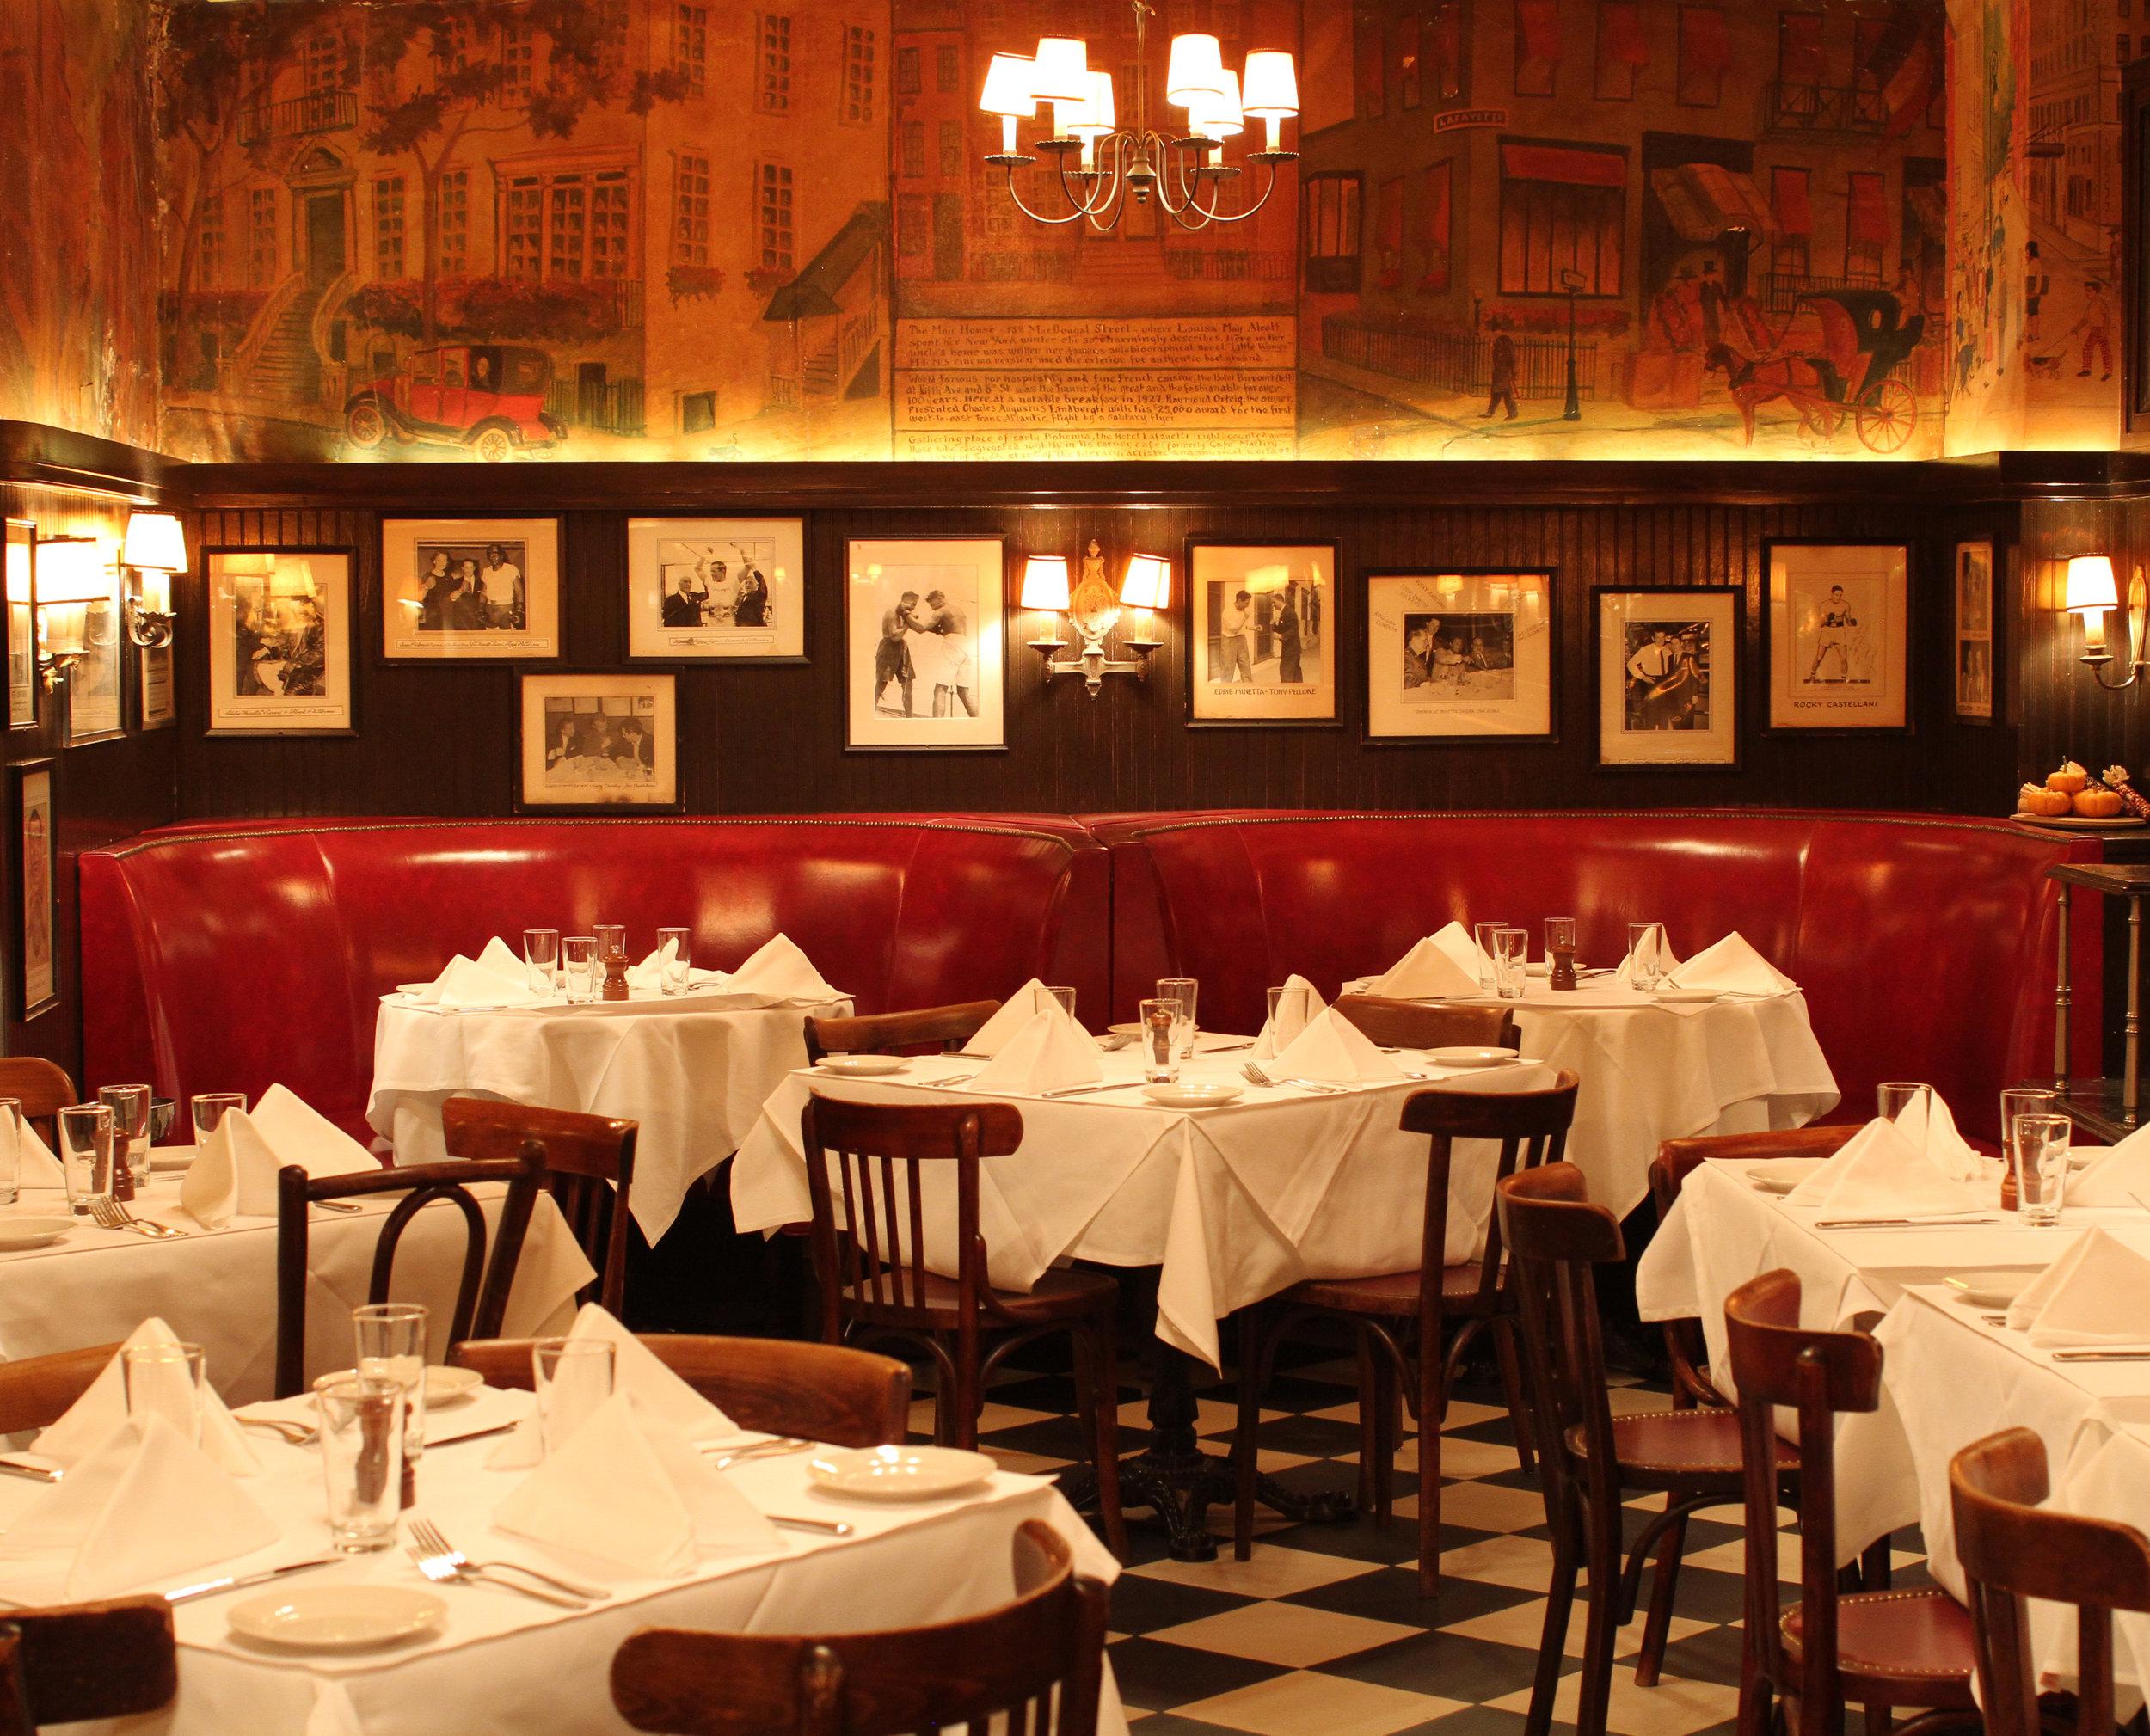 MinettaTavern_Dining Room Booths_Harry McNally_6_CROP.jpg